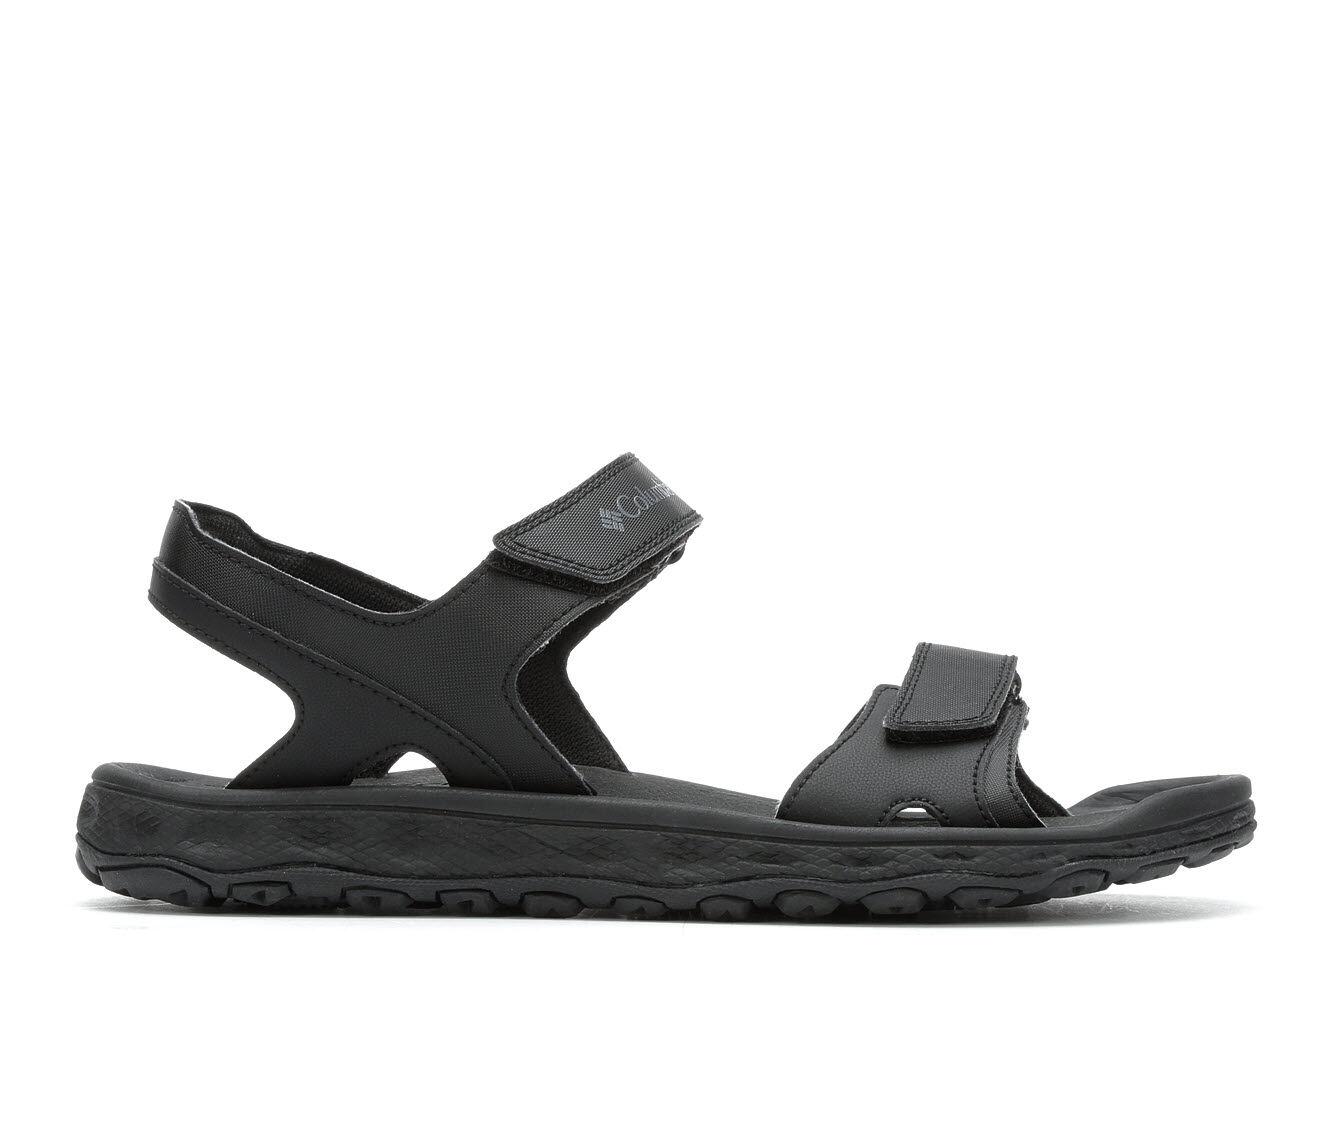 Men's Columbia Buxton 2 Strap Outdoor Sandals Black/Charcoal